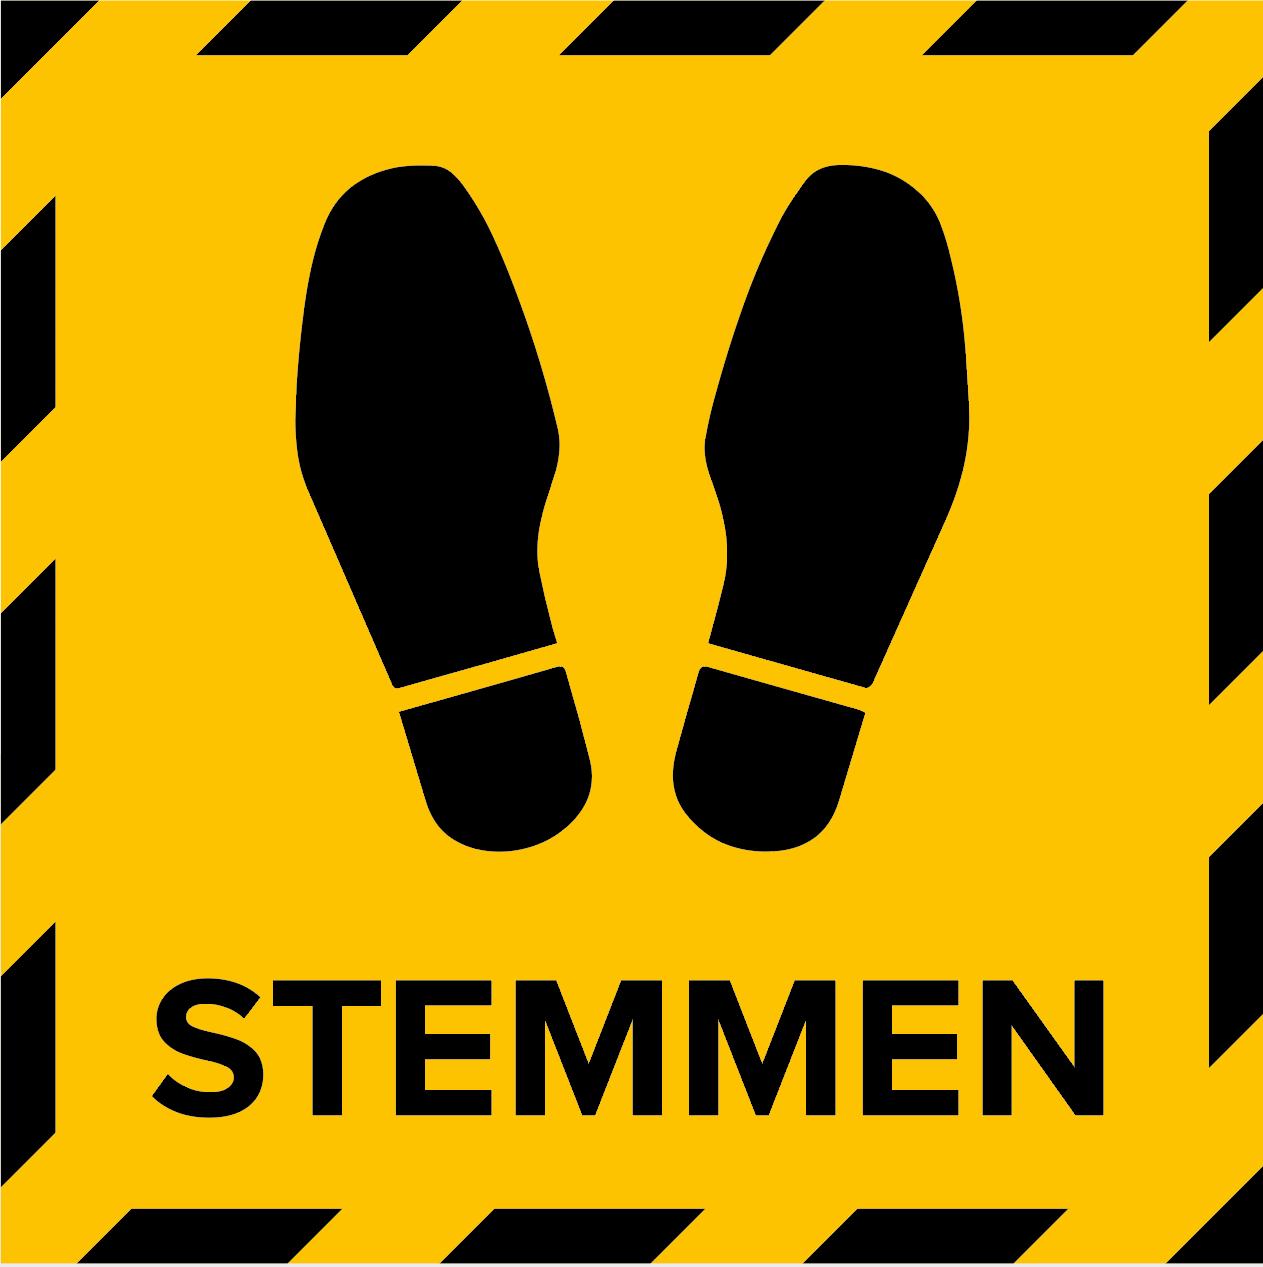 Metromark + Igepa vloerlaminaat Stembureau vloersticker stemplaats (15 x 15 CM)